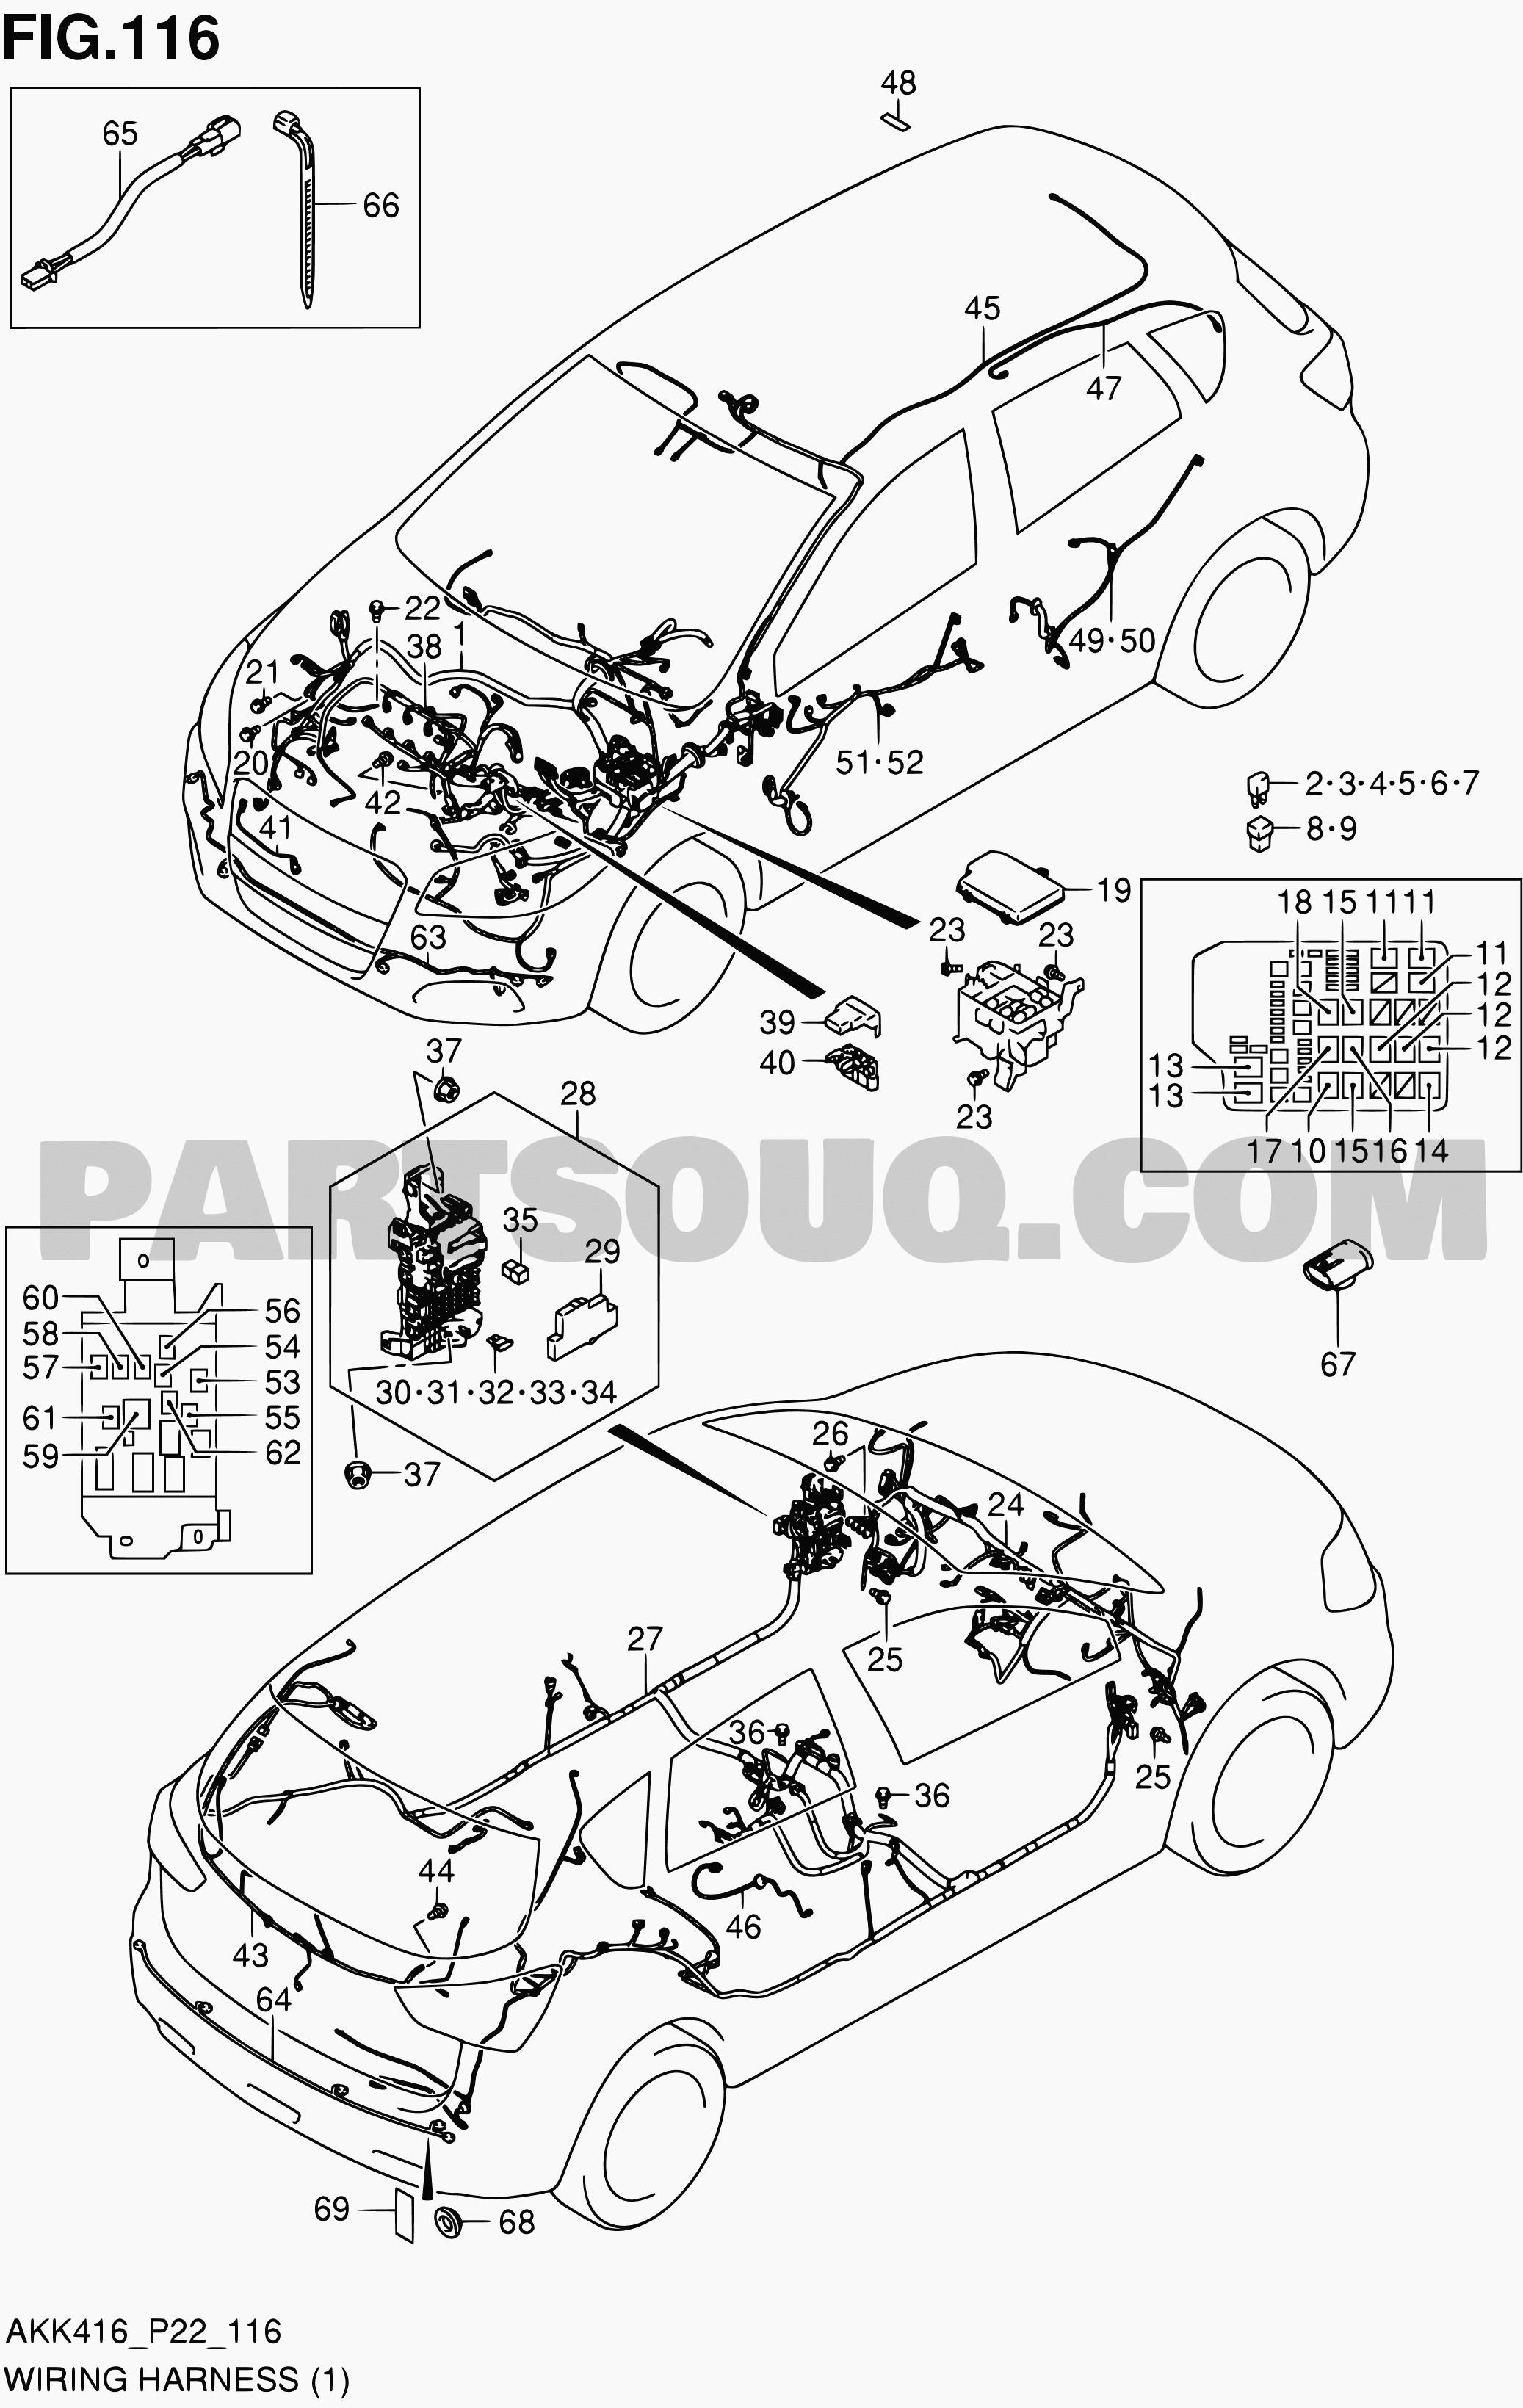 Unique car undercarriage parts diagram adornment simple wiring